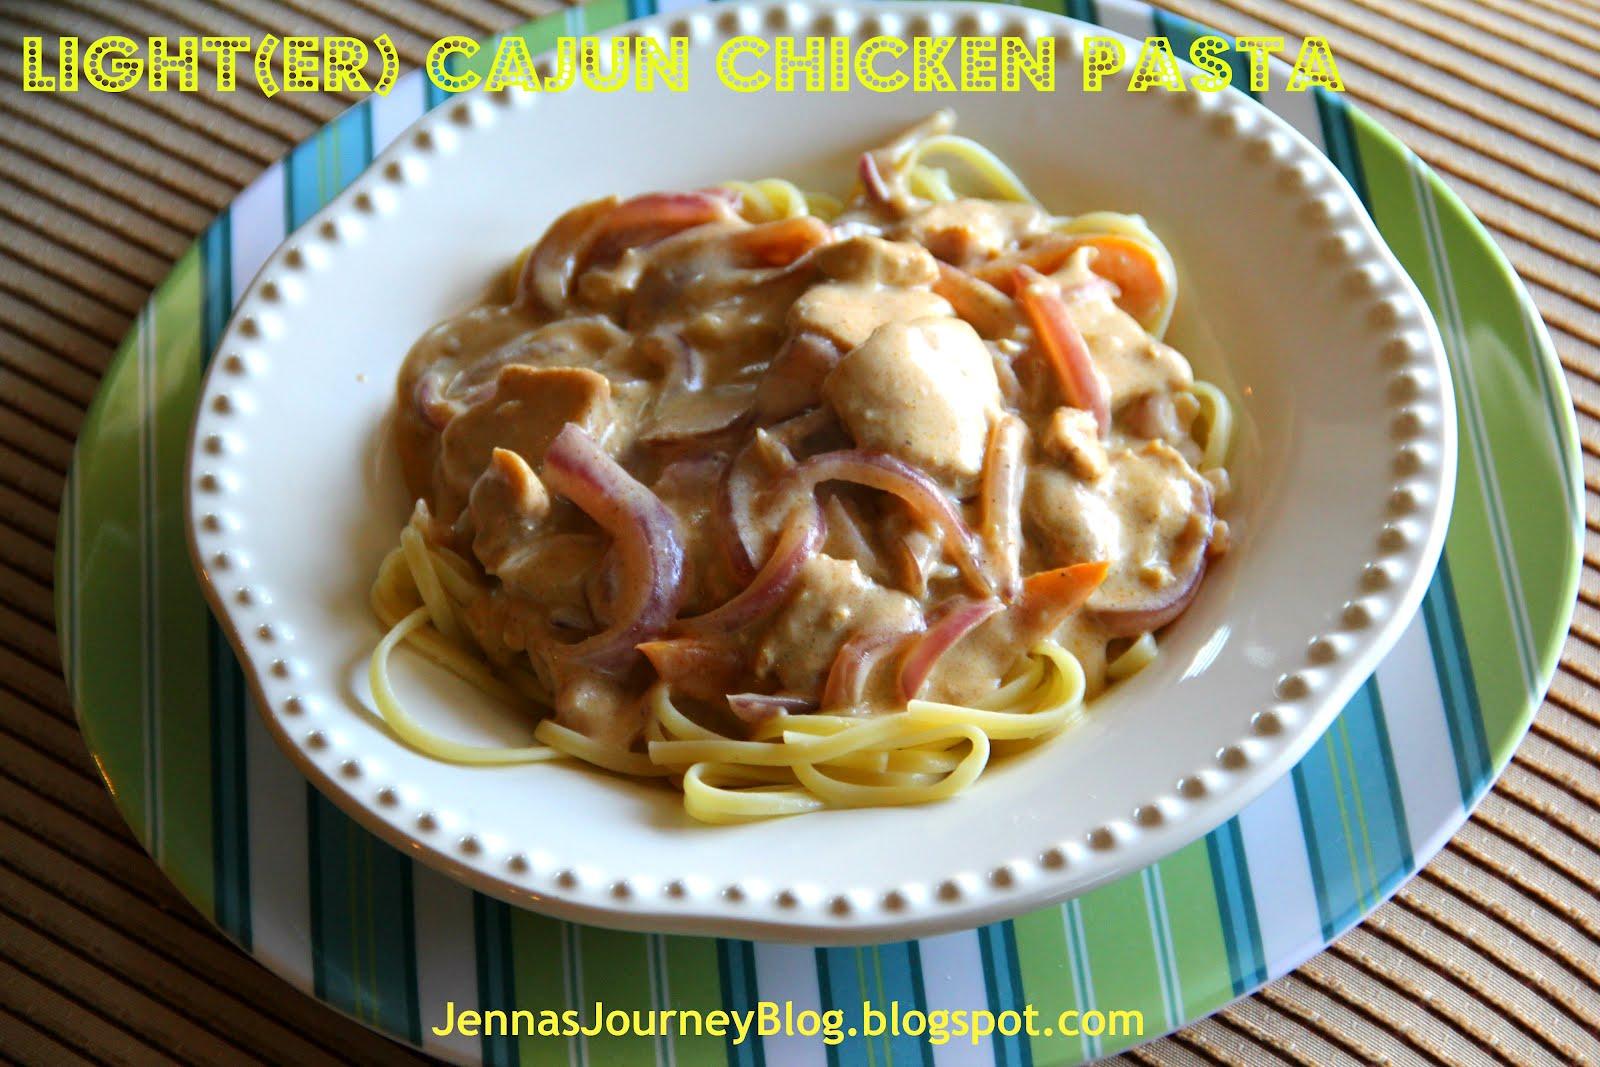 Jenna Blogs: Light(er) Cajun Chicken Pasta